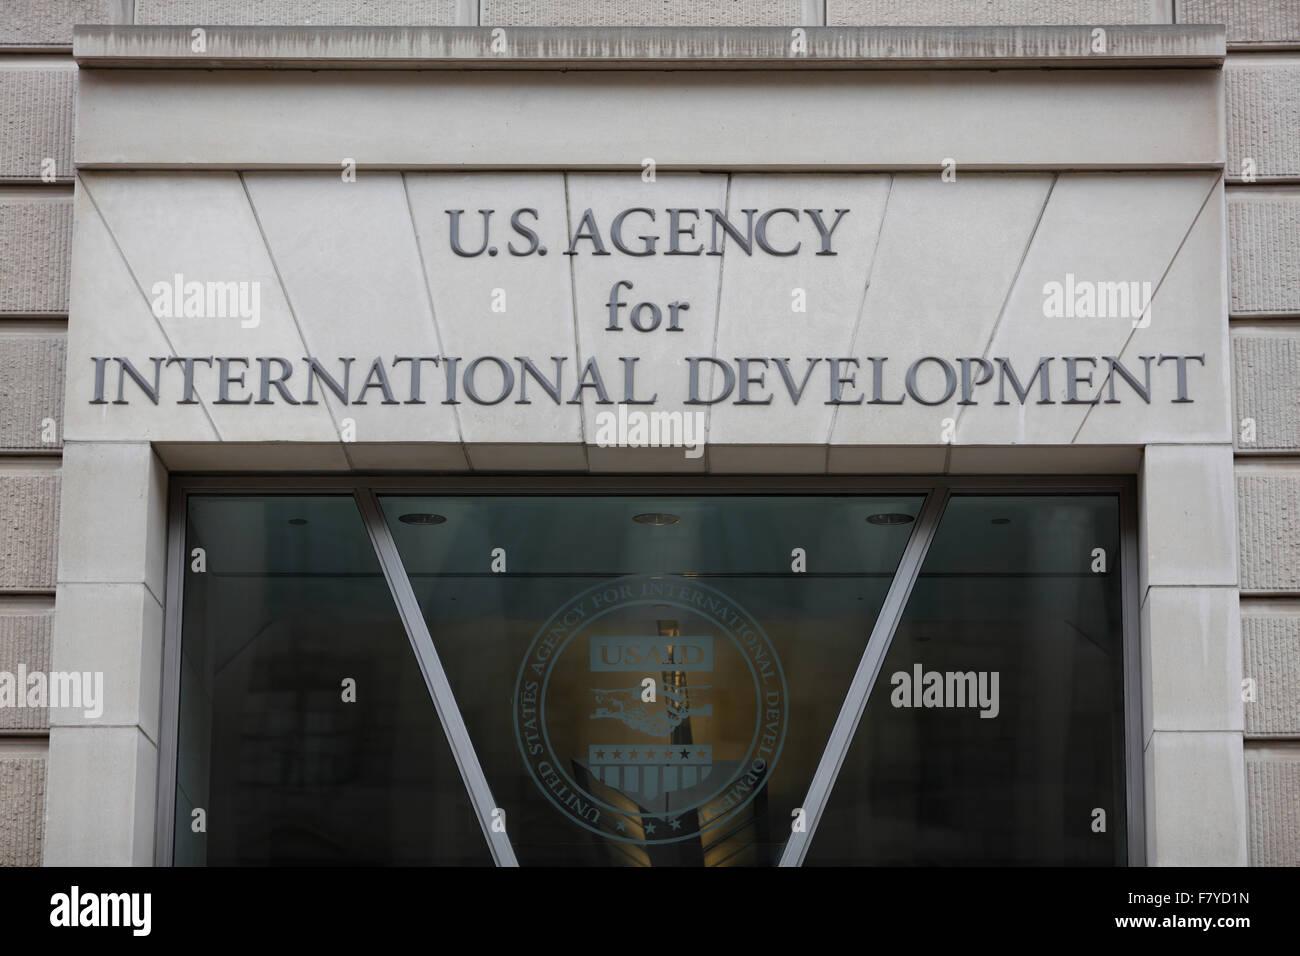 Office, US Agency for International Development, Ronald Reagan Building, Washington, D.C., United States - Stock Image